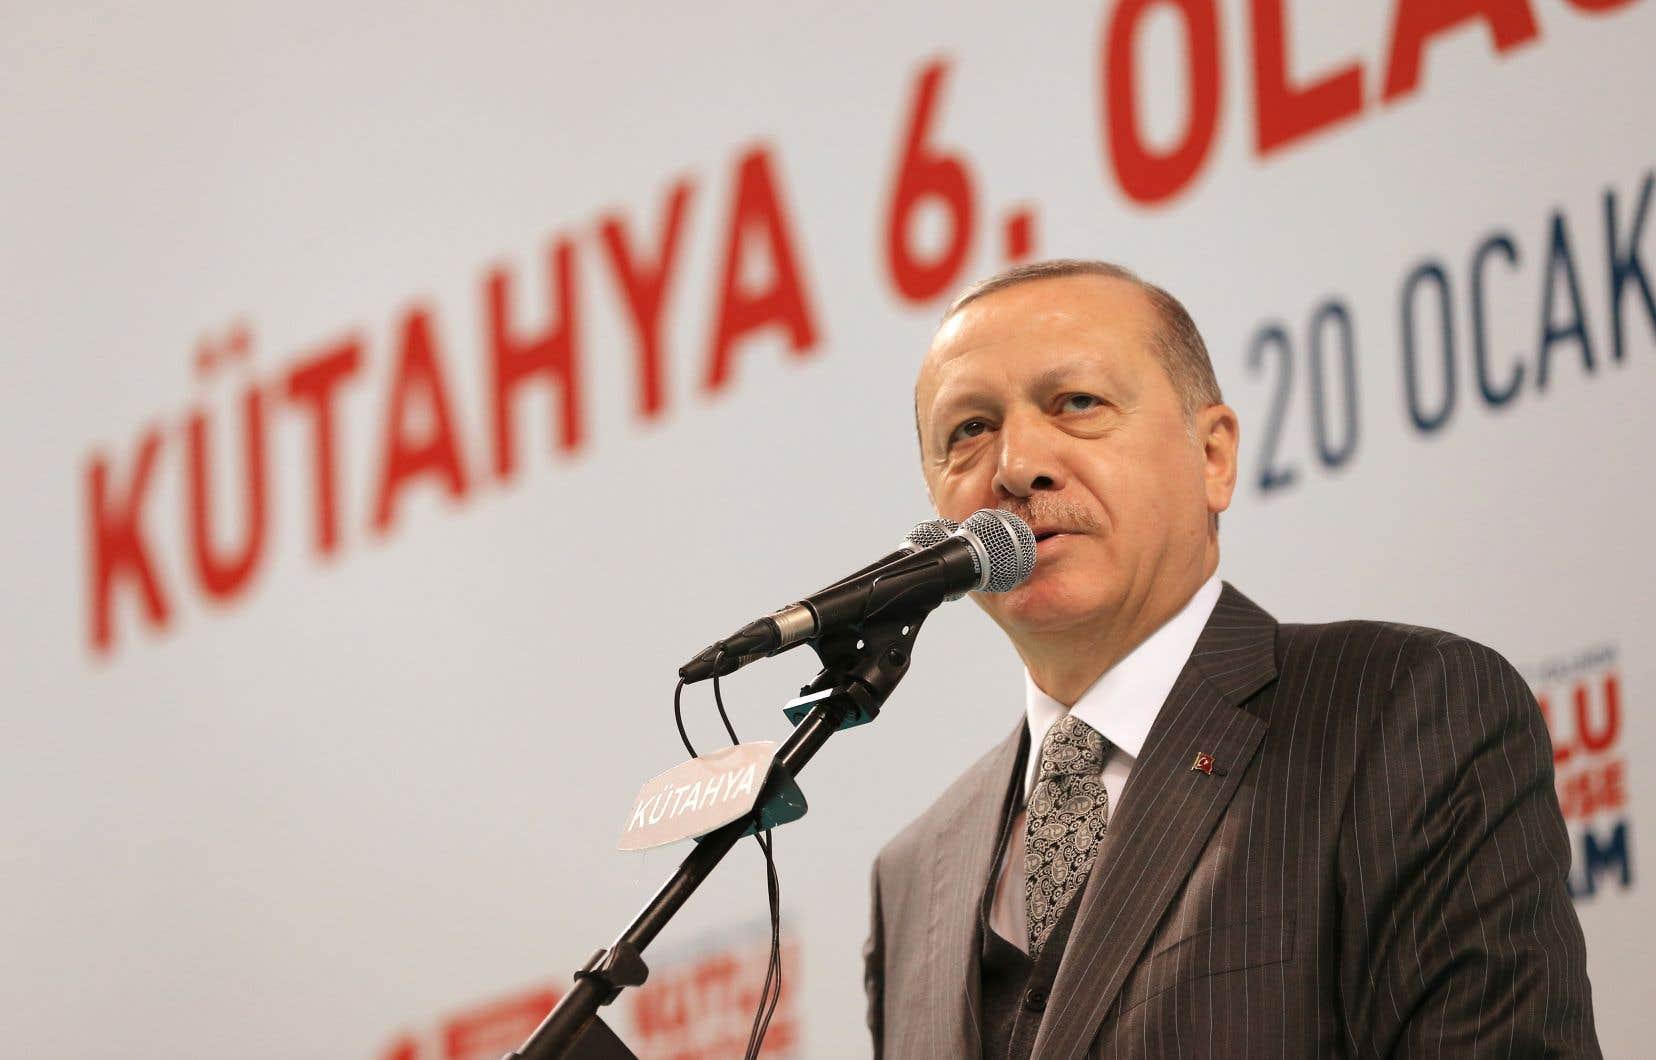 Le président turc, Recep Tayyip Erdogan, samedi à Kutahya